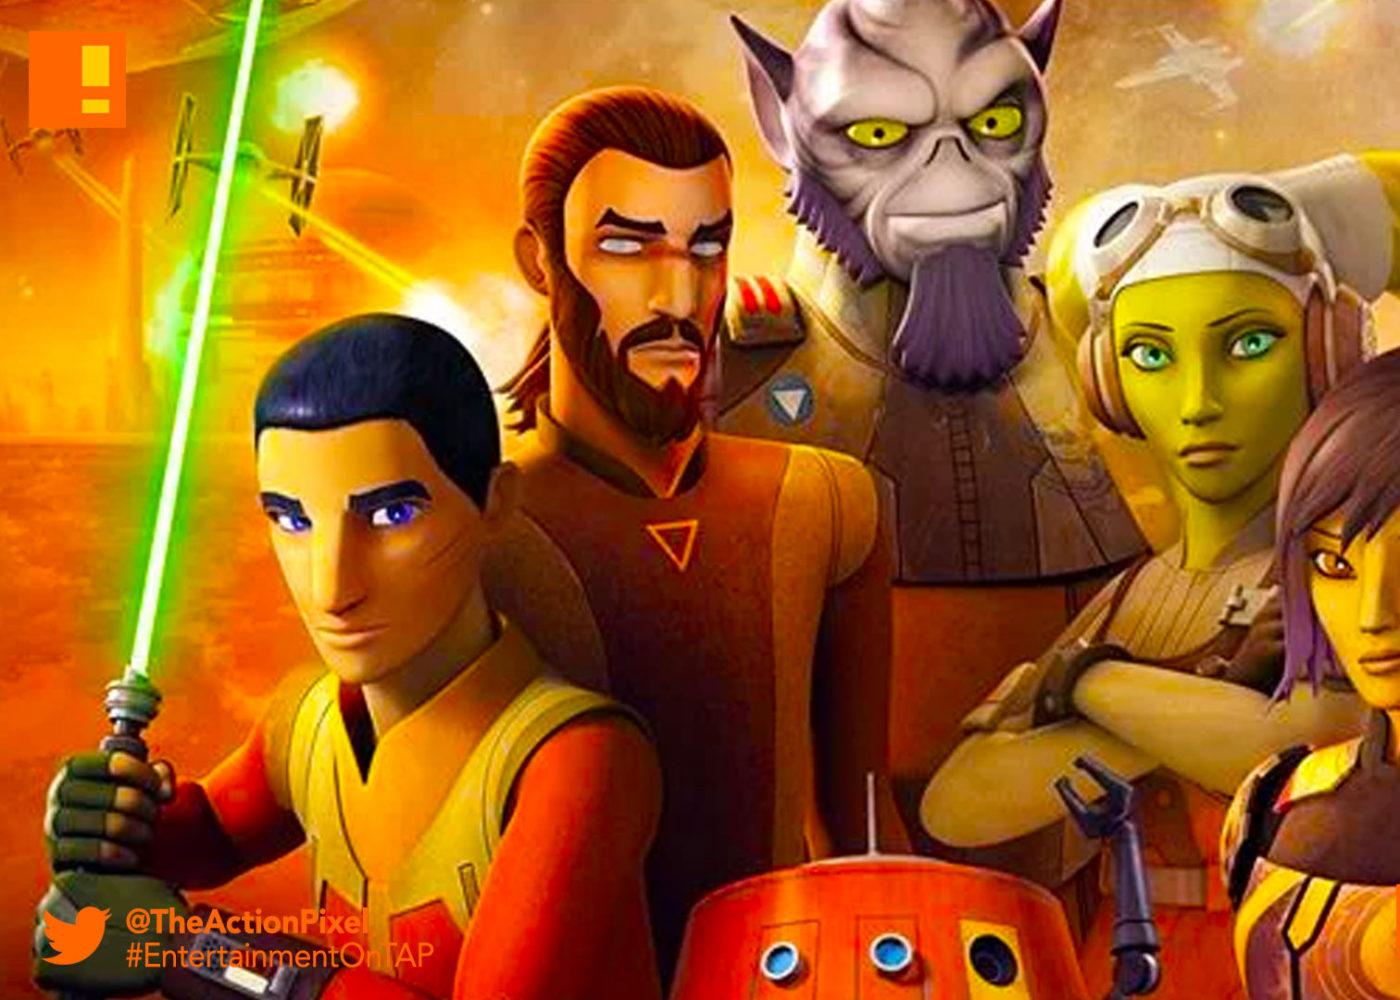 poster, sw rebels, star wars rebels , Season 4, the action pixel, disney, lucasfilm, disney xd, the action pixel, entertainment on tap,